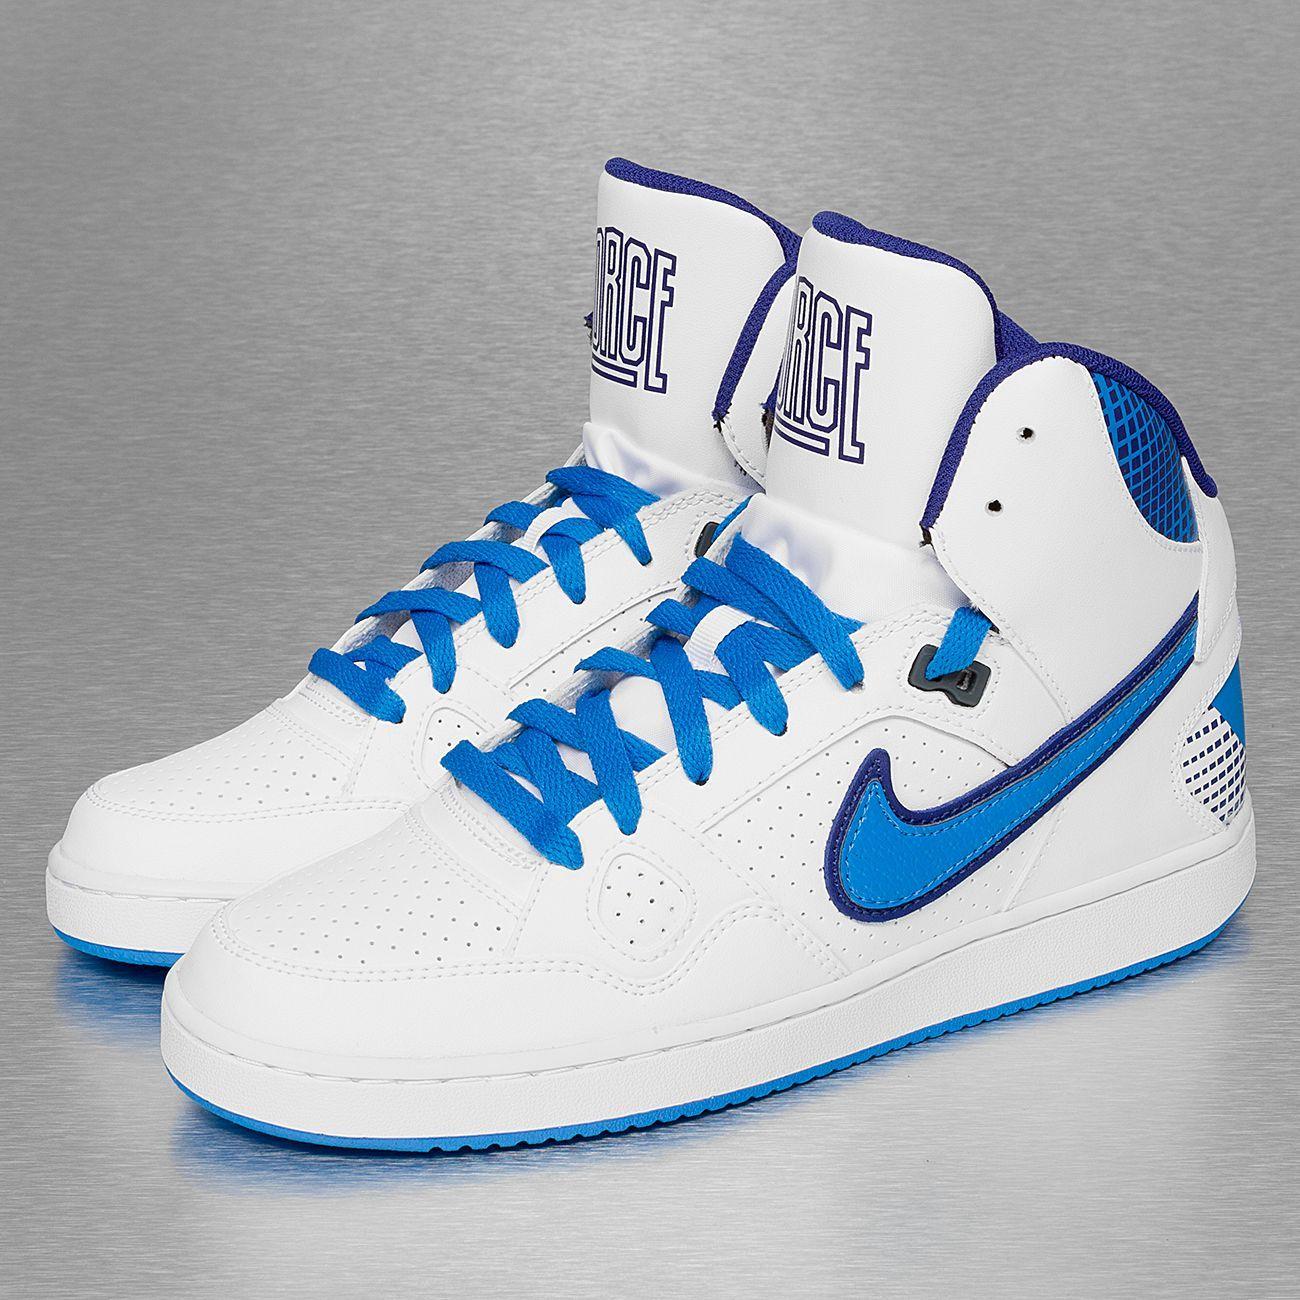 Nike Son Of Force Mid Basketball Shoes WhitePhoto Blue